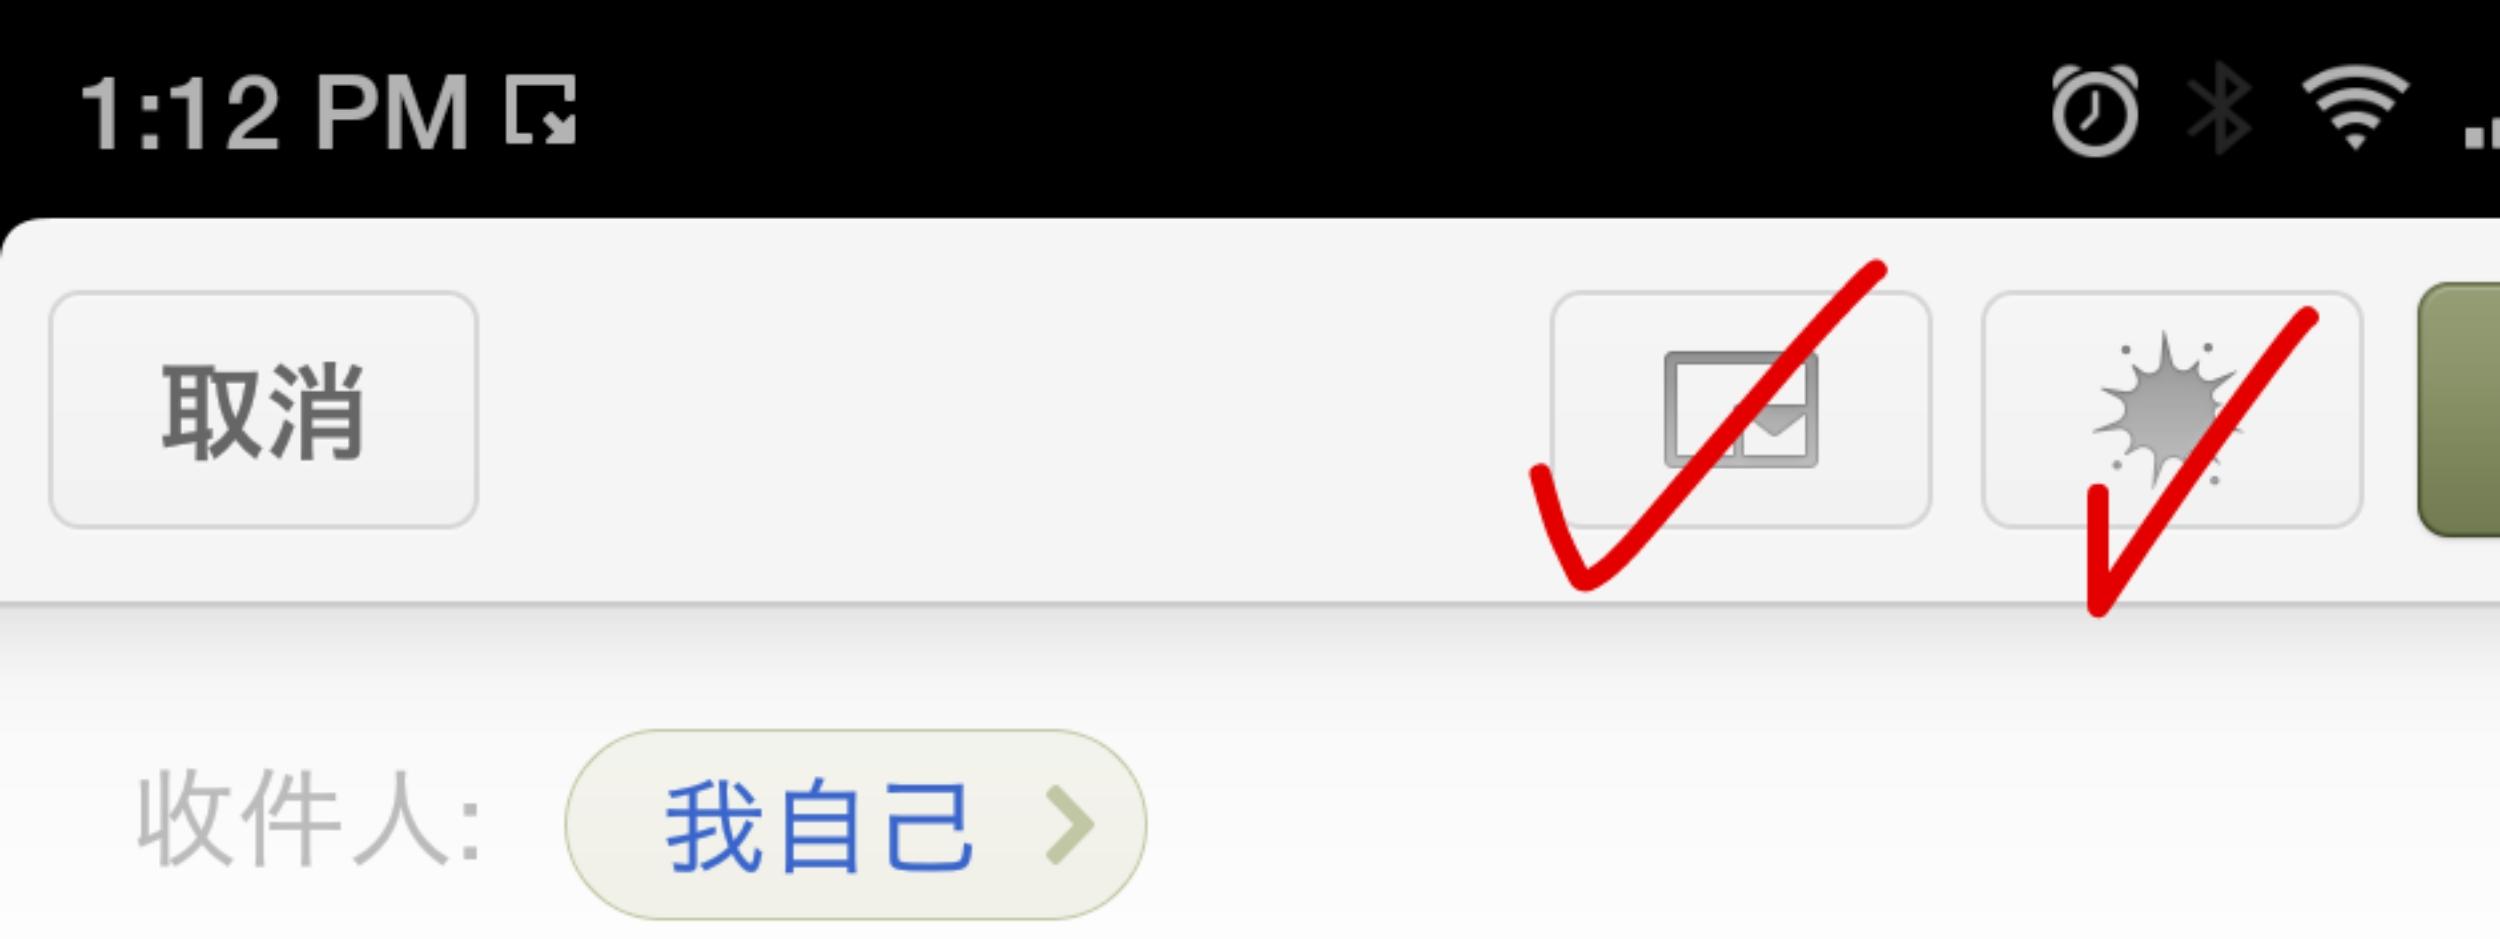 ??_Screenshot_2019-02-22-13-12-16-460_??.png